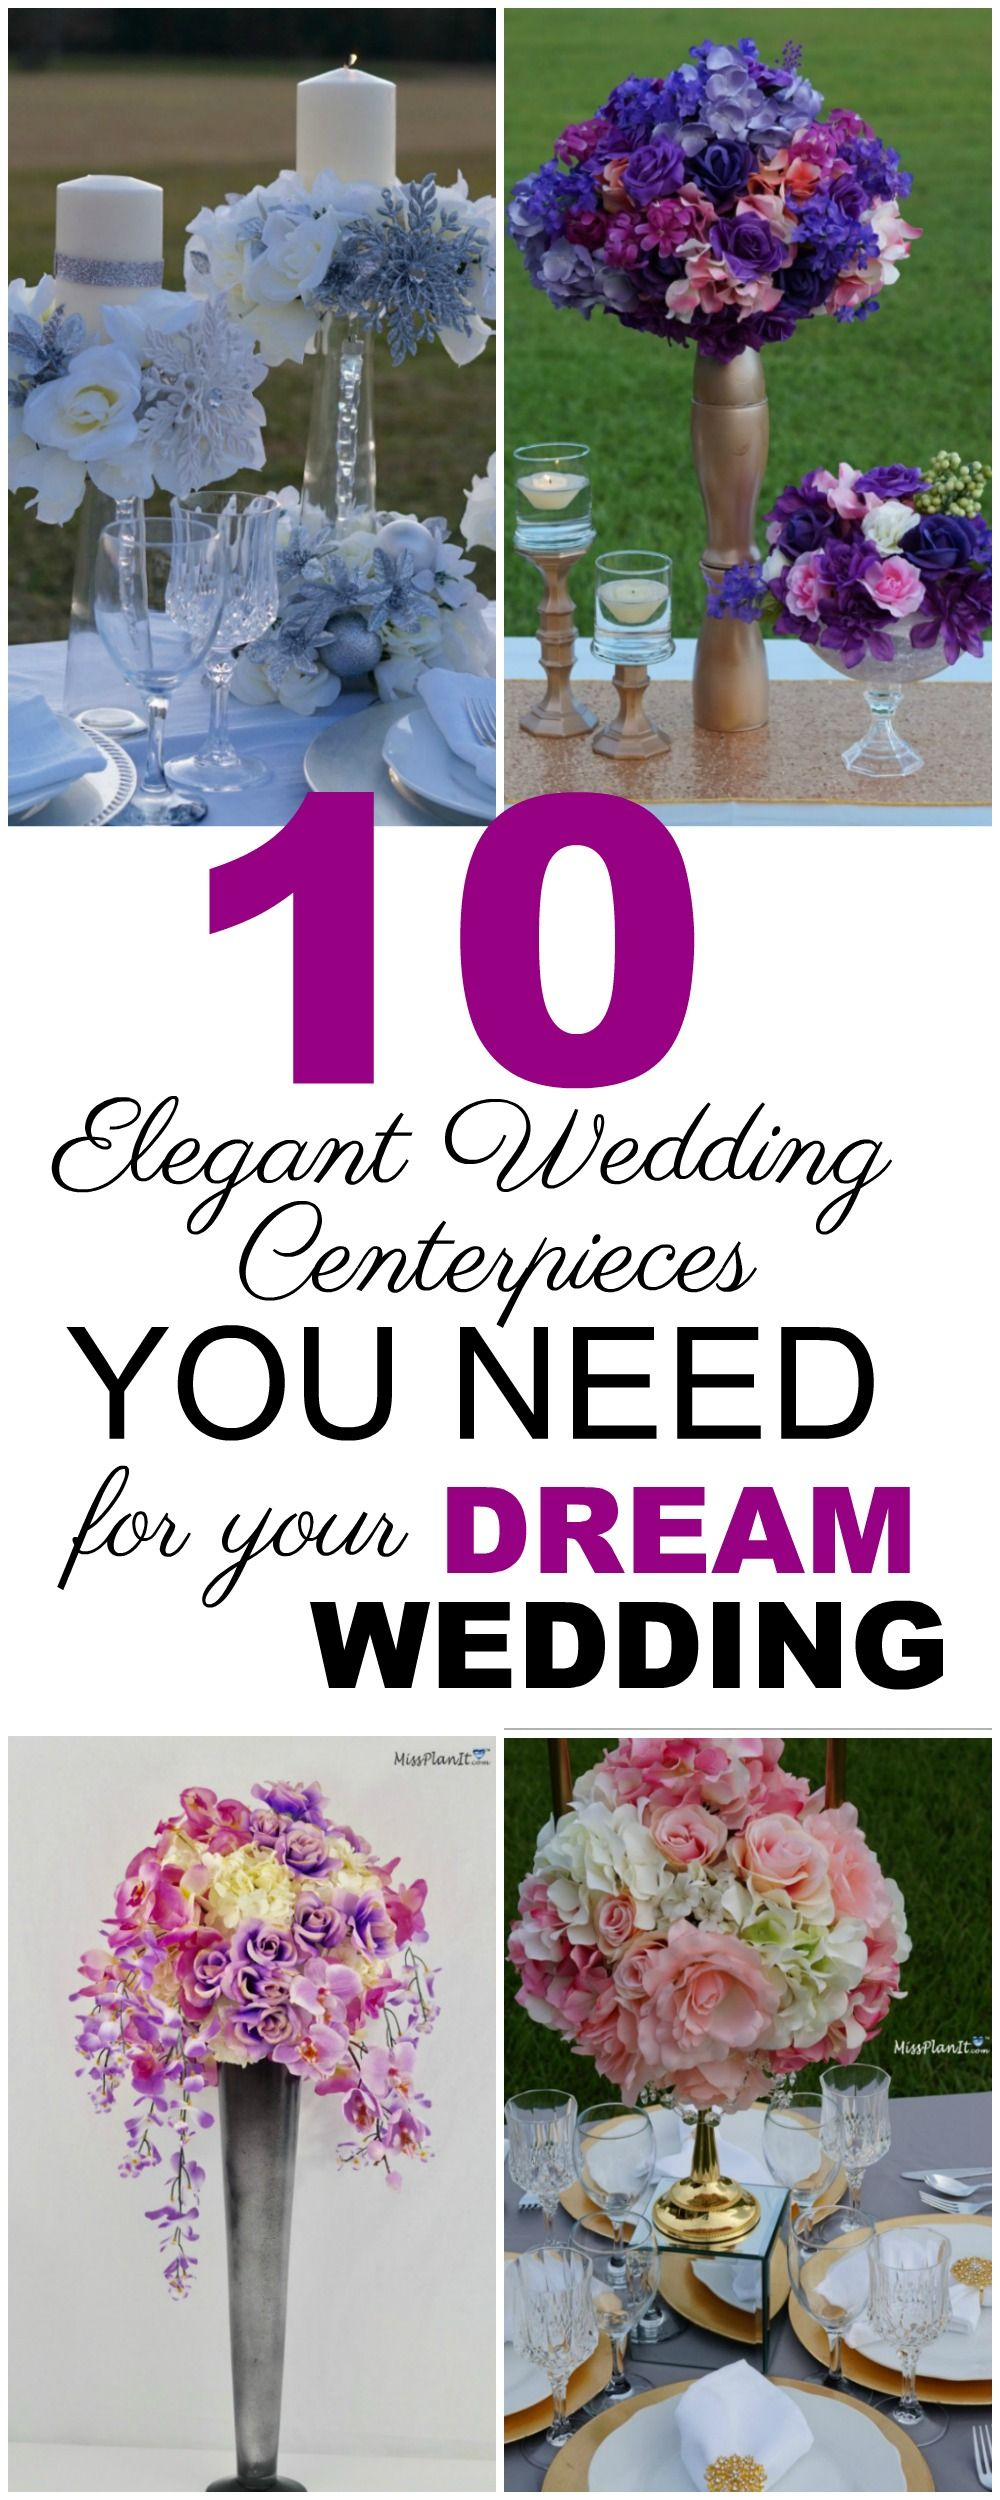 Diy elegant wedding decorations   Elegant Wedding Centerpieces You Need For Your Dream Wedding